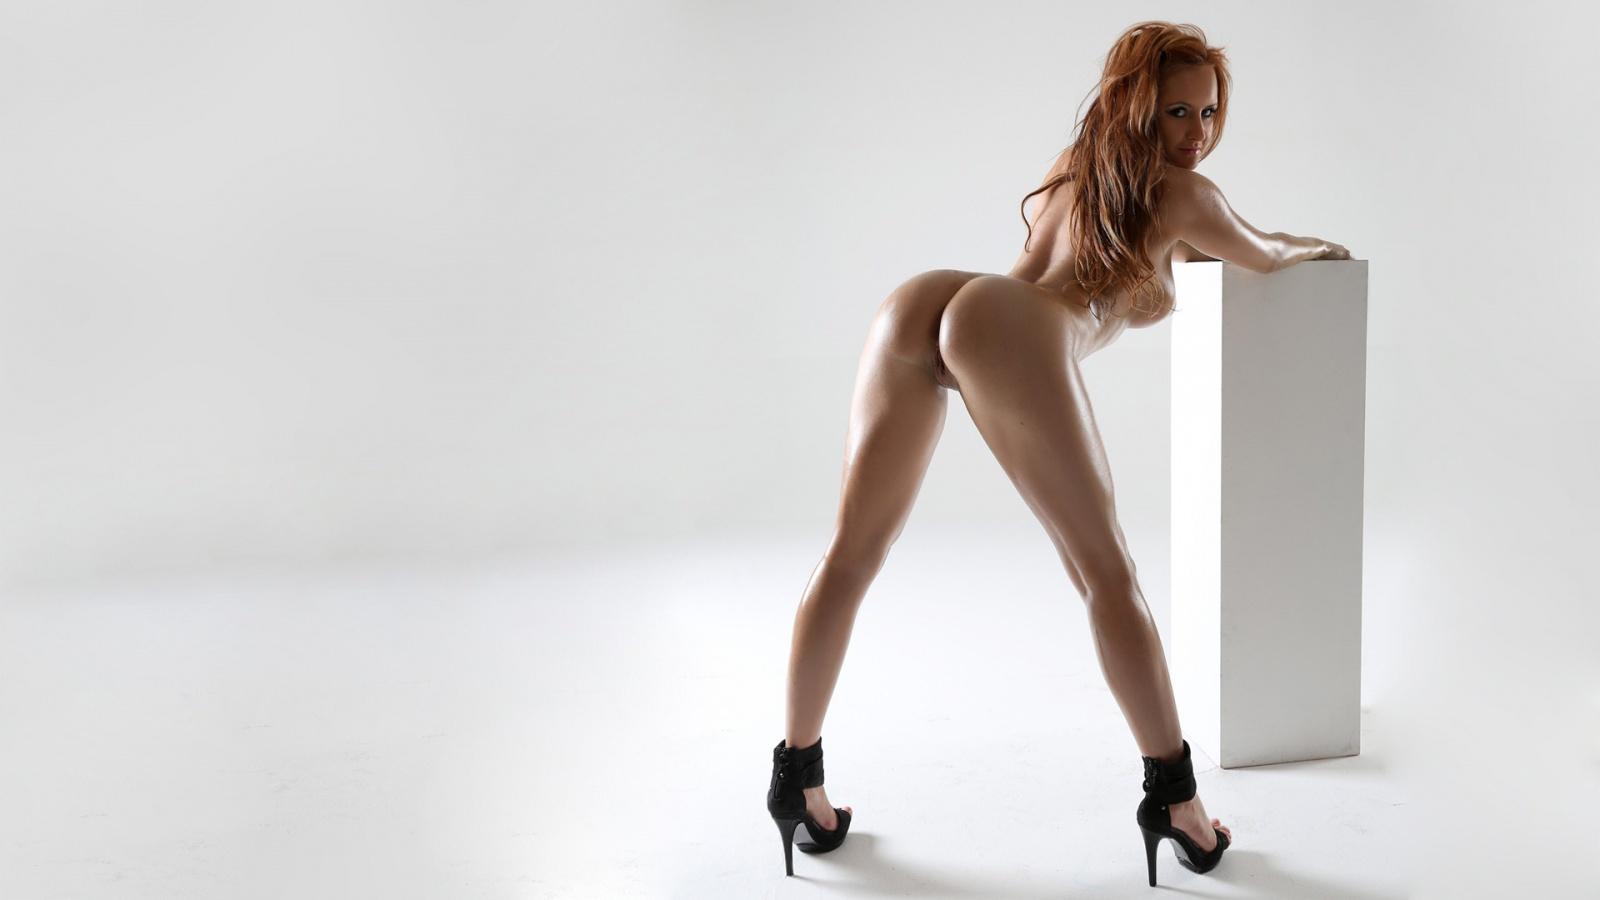 fake naija pastor power enter scandal xxxbunker com porn tube